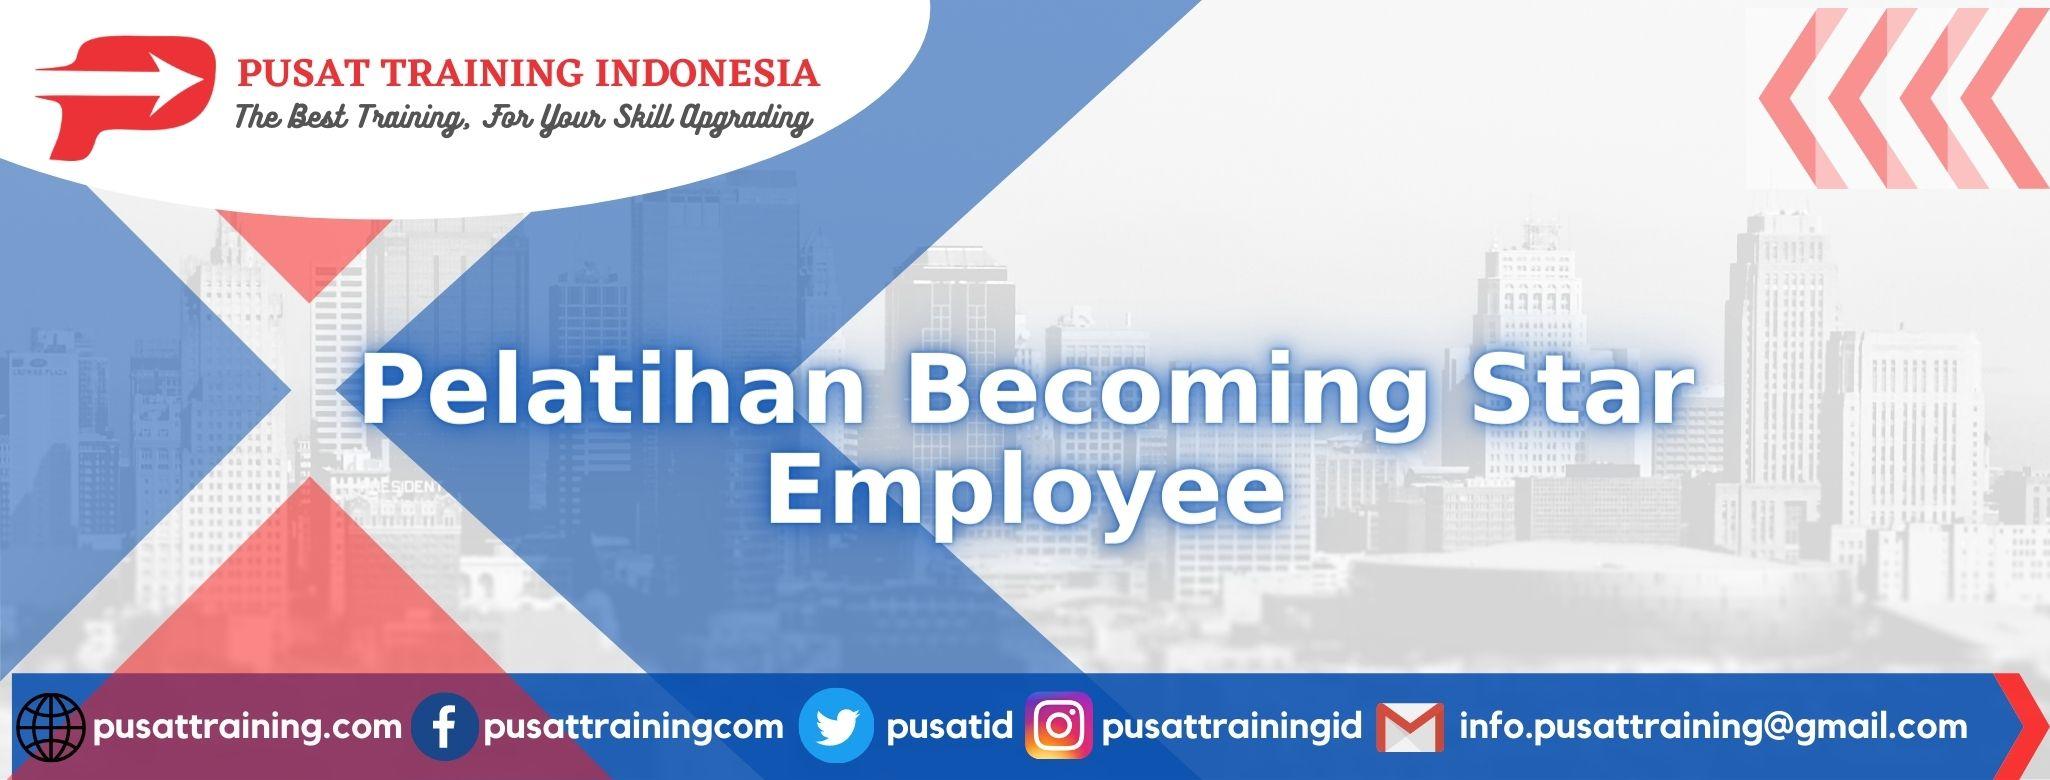 Pelatihan-Becoming-Star-Employee